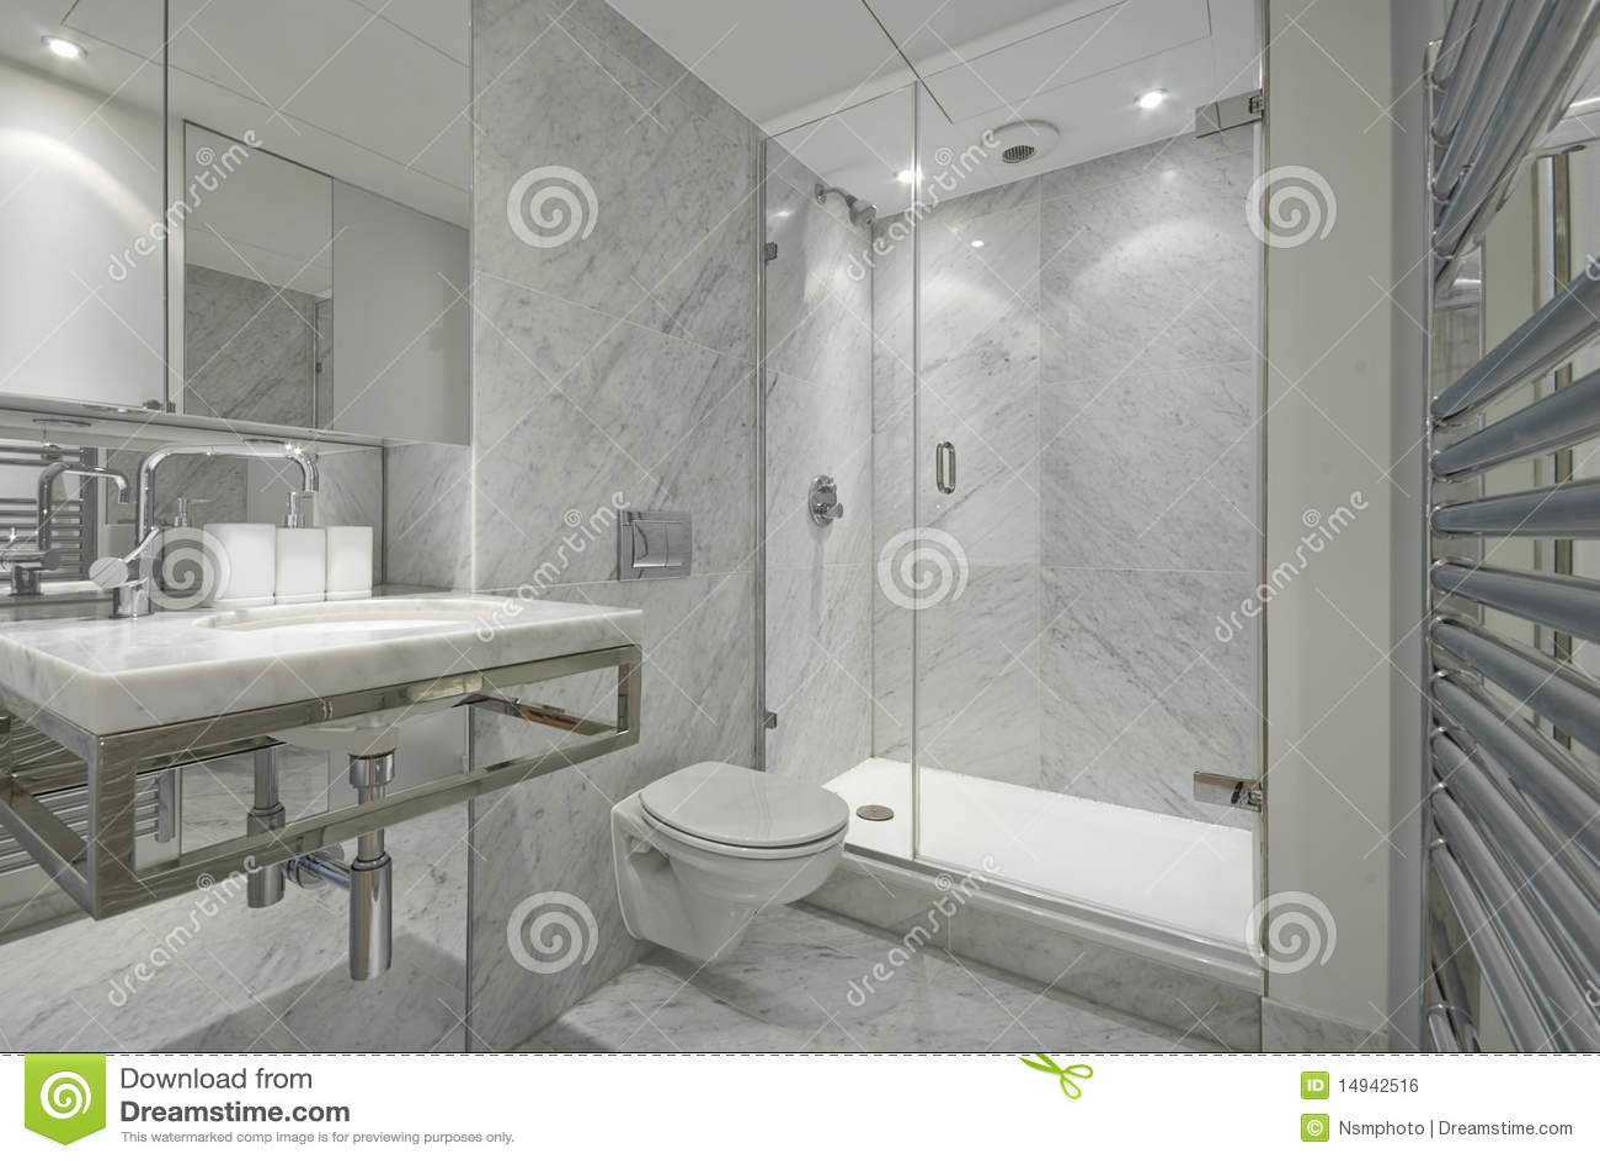 Modern En Suite Marble Bathroom In White Royalty Free Stock Image  Image 14942516